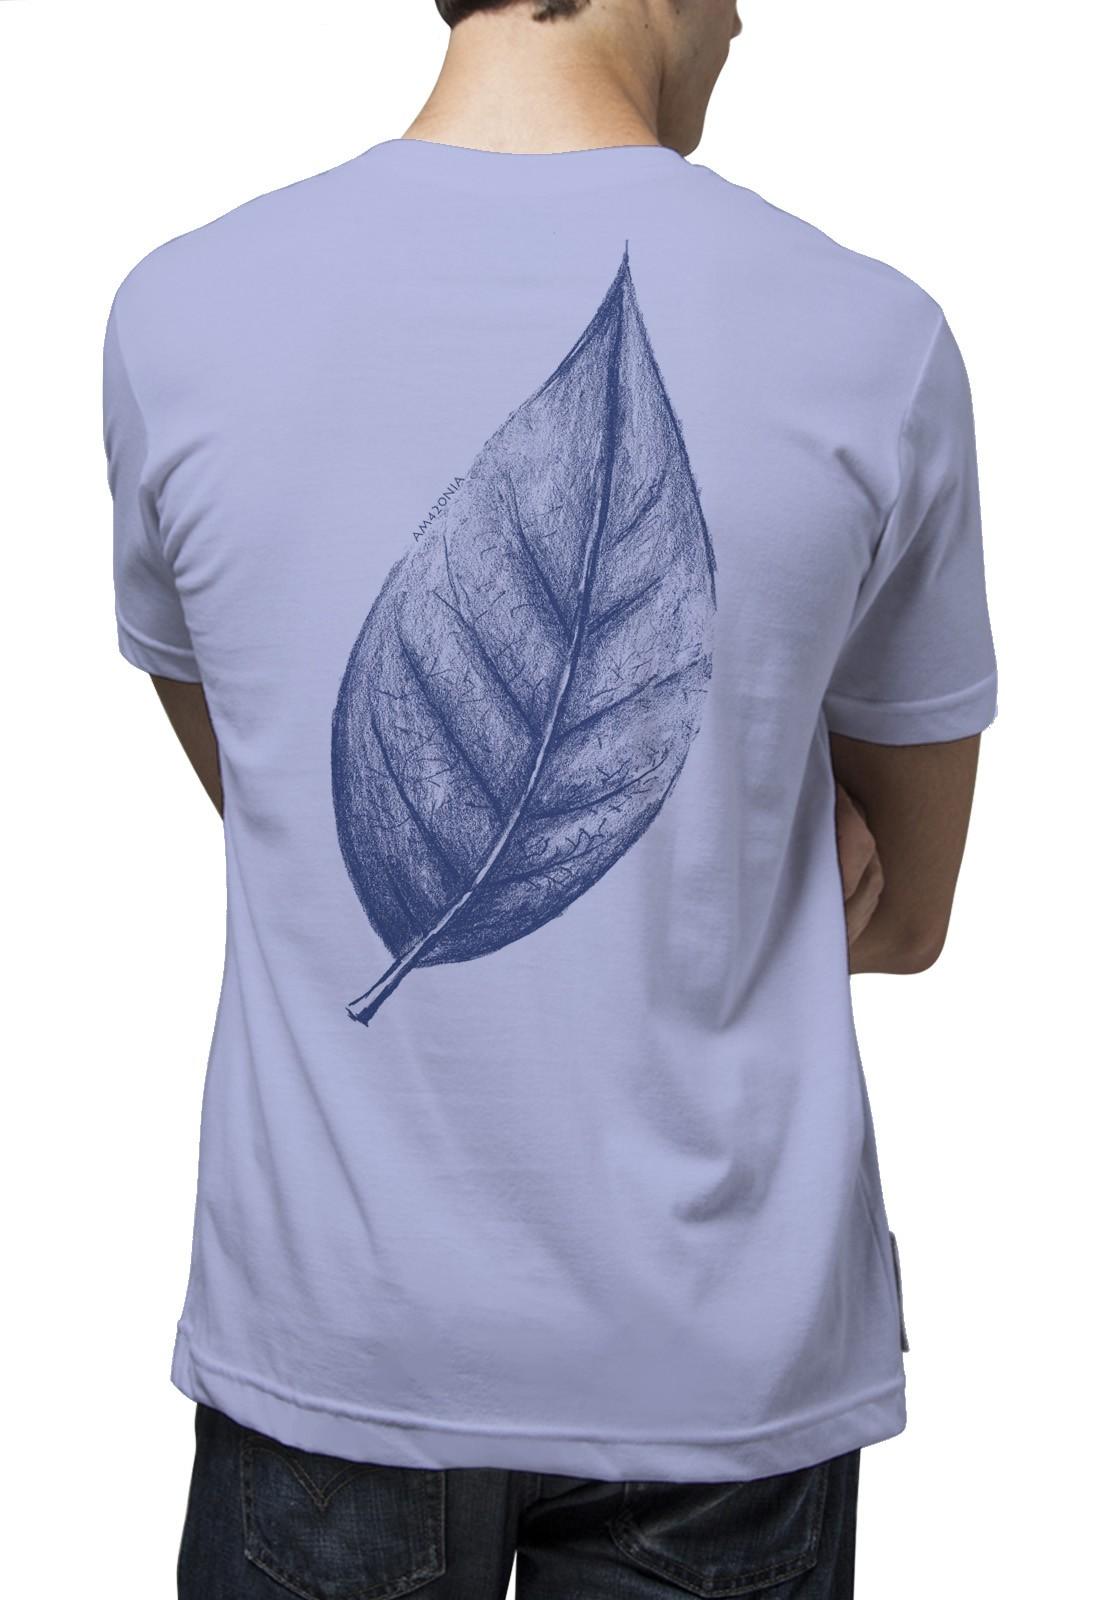 Camiseta Amazônia Big Leaf - Lilás